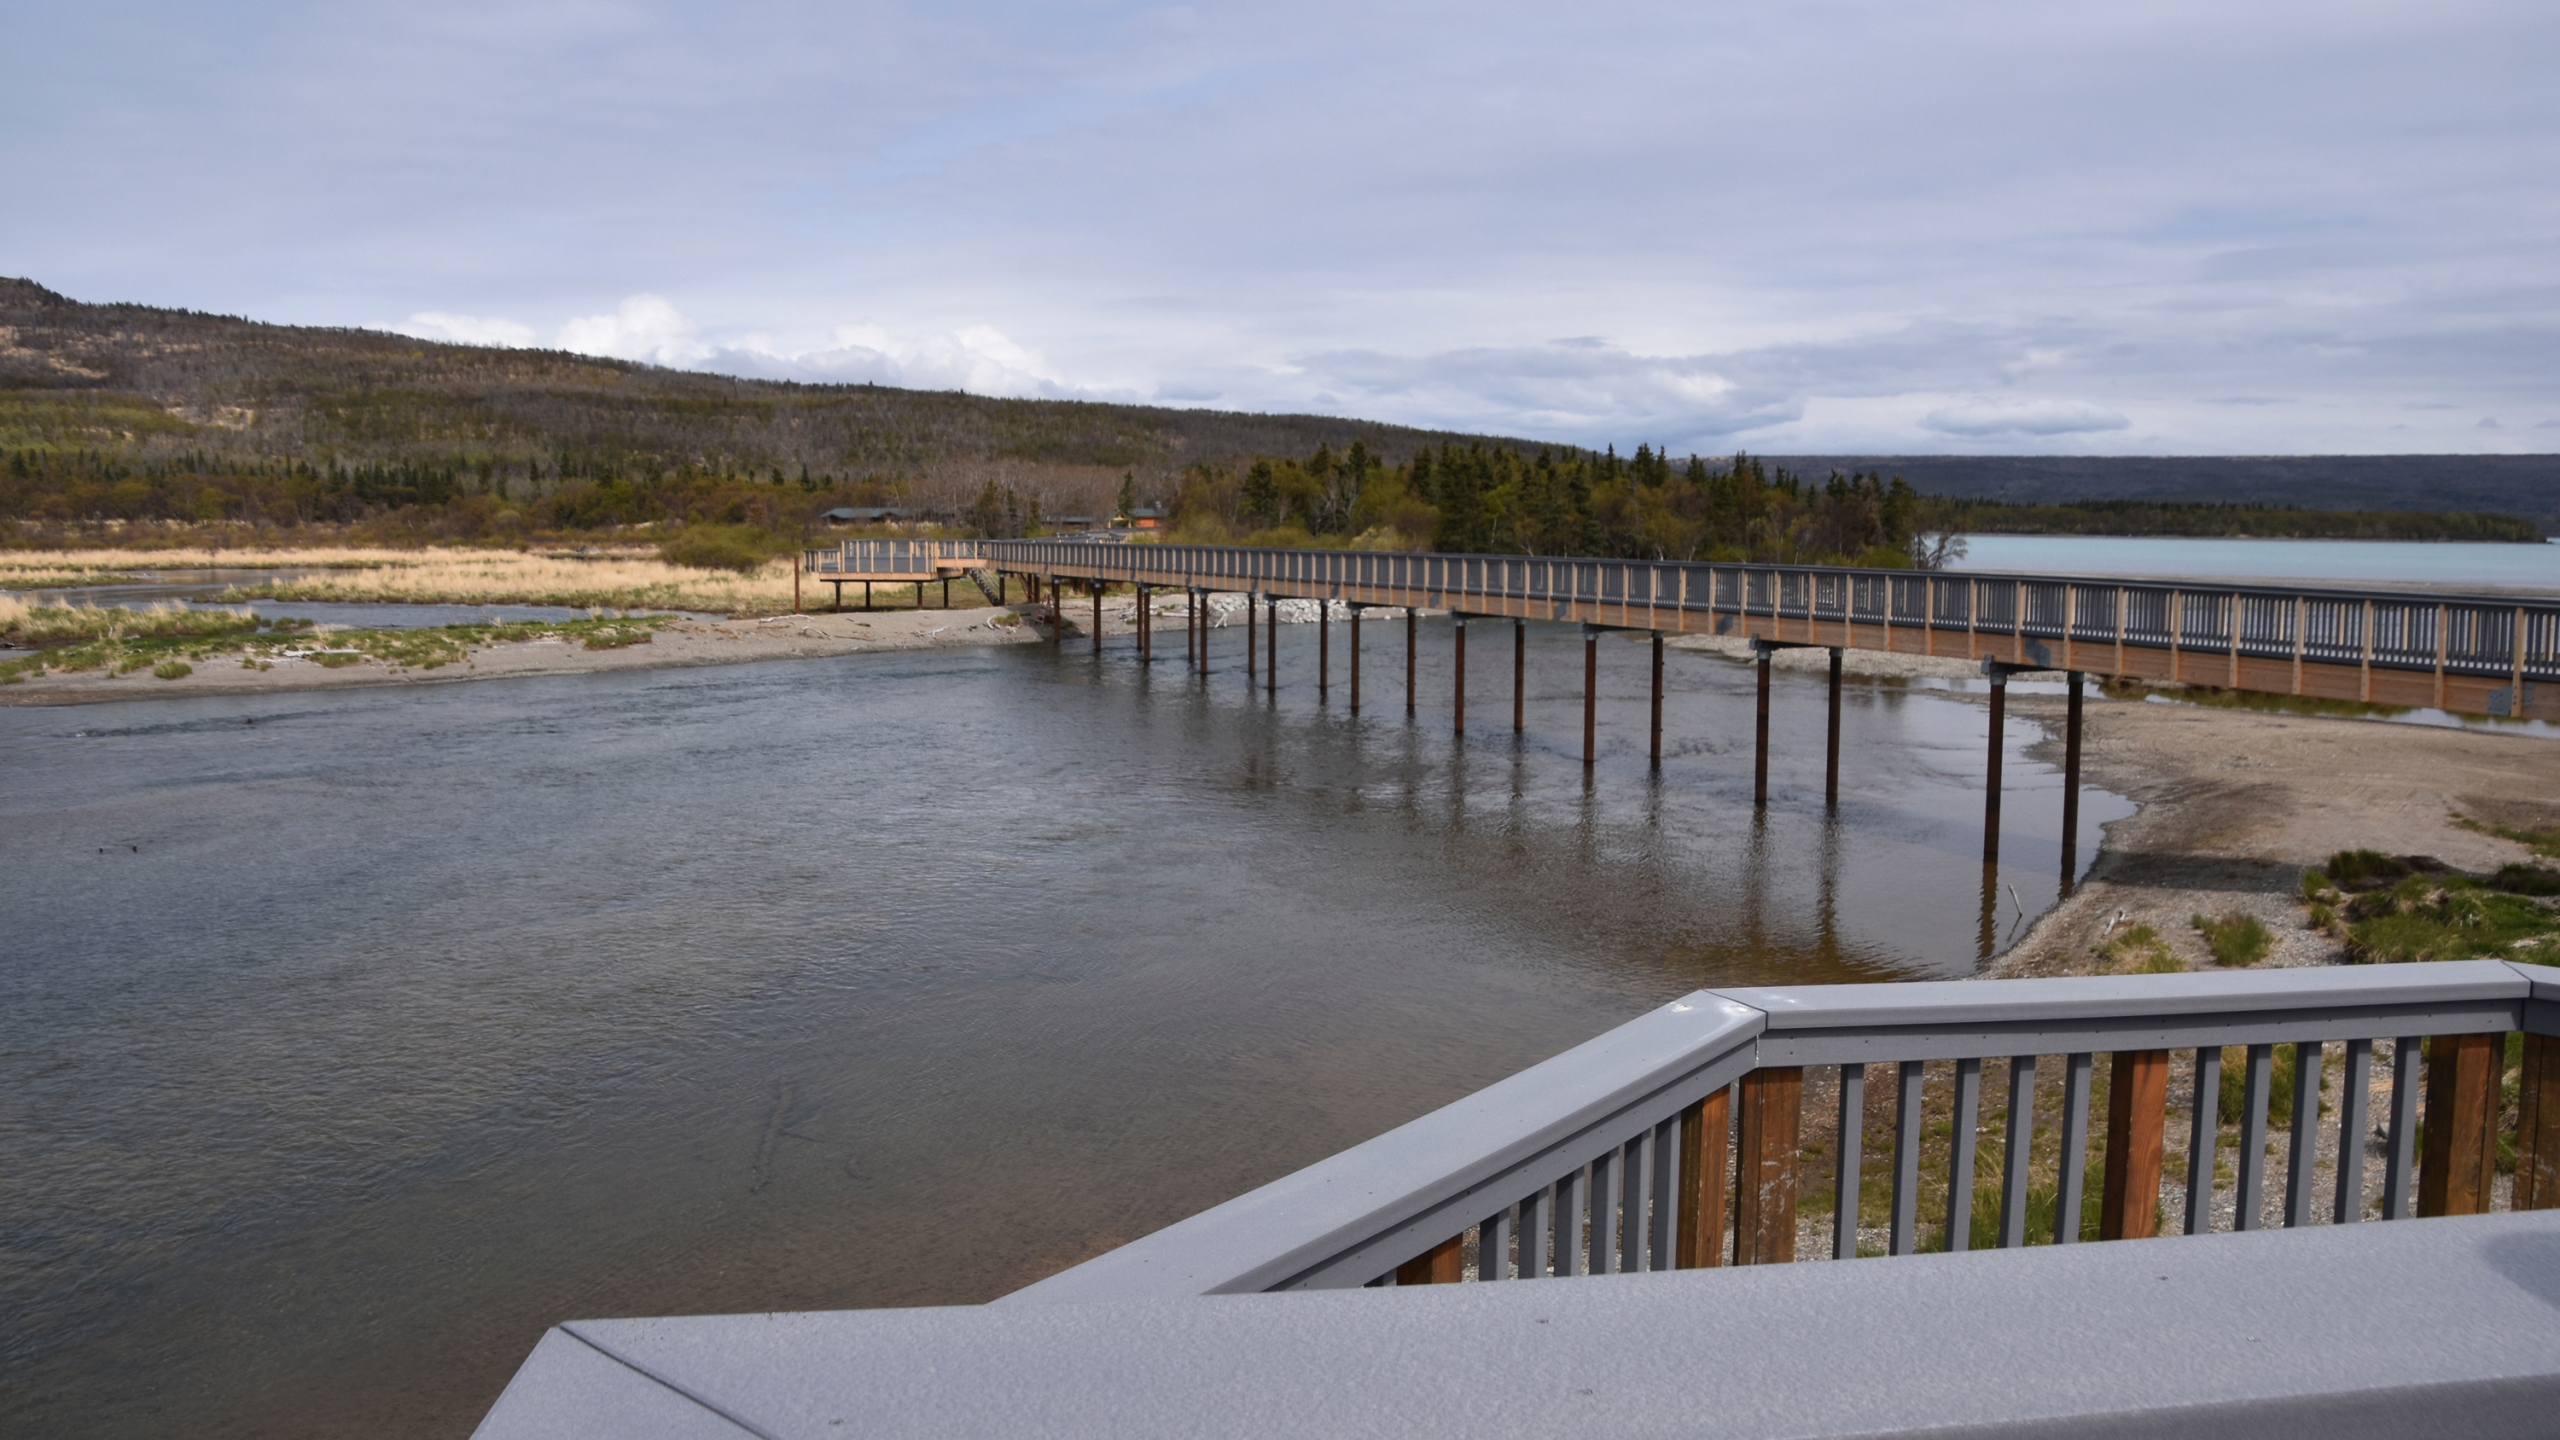 Bear_Bridge-Katmai_32142-159532.jpg44568133